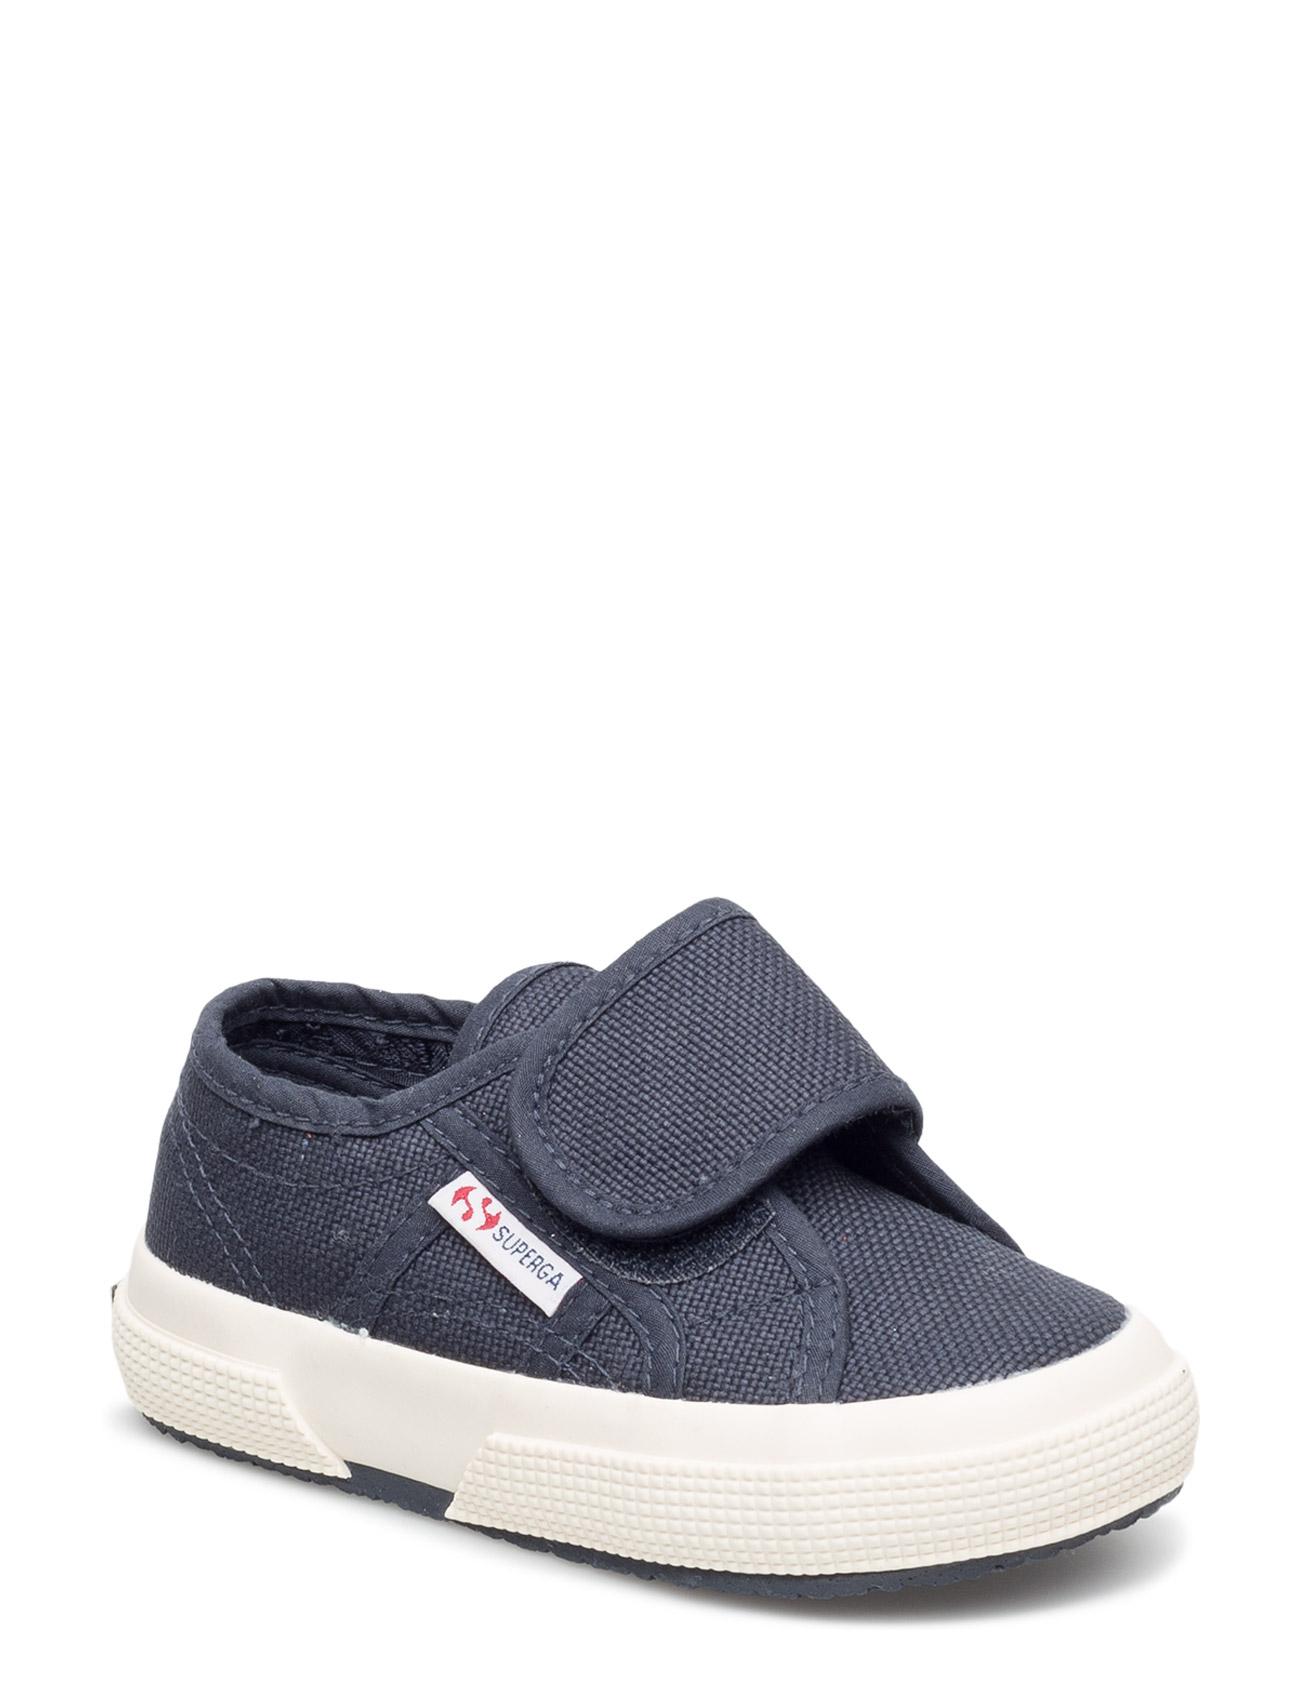 Superga 2750 Bvel Superga Sko & Sneakers til Børn i Navy blå